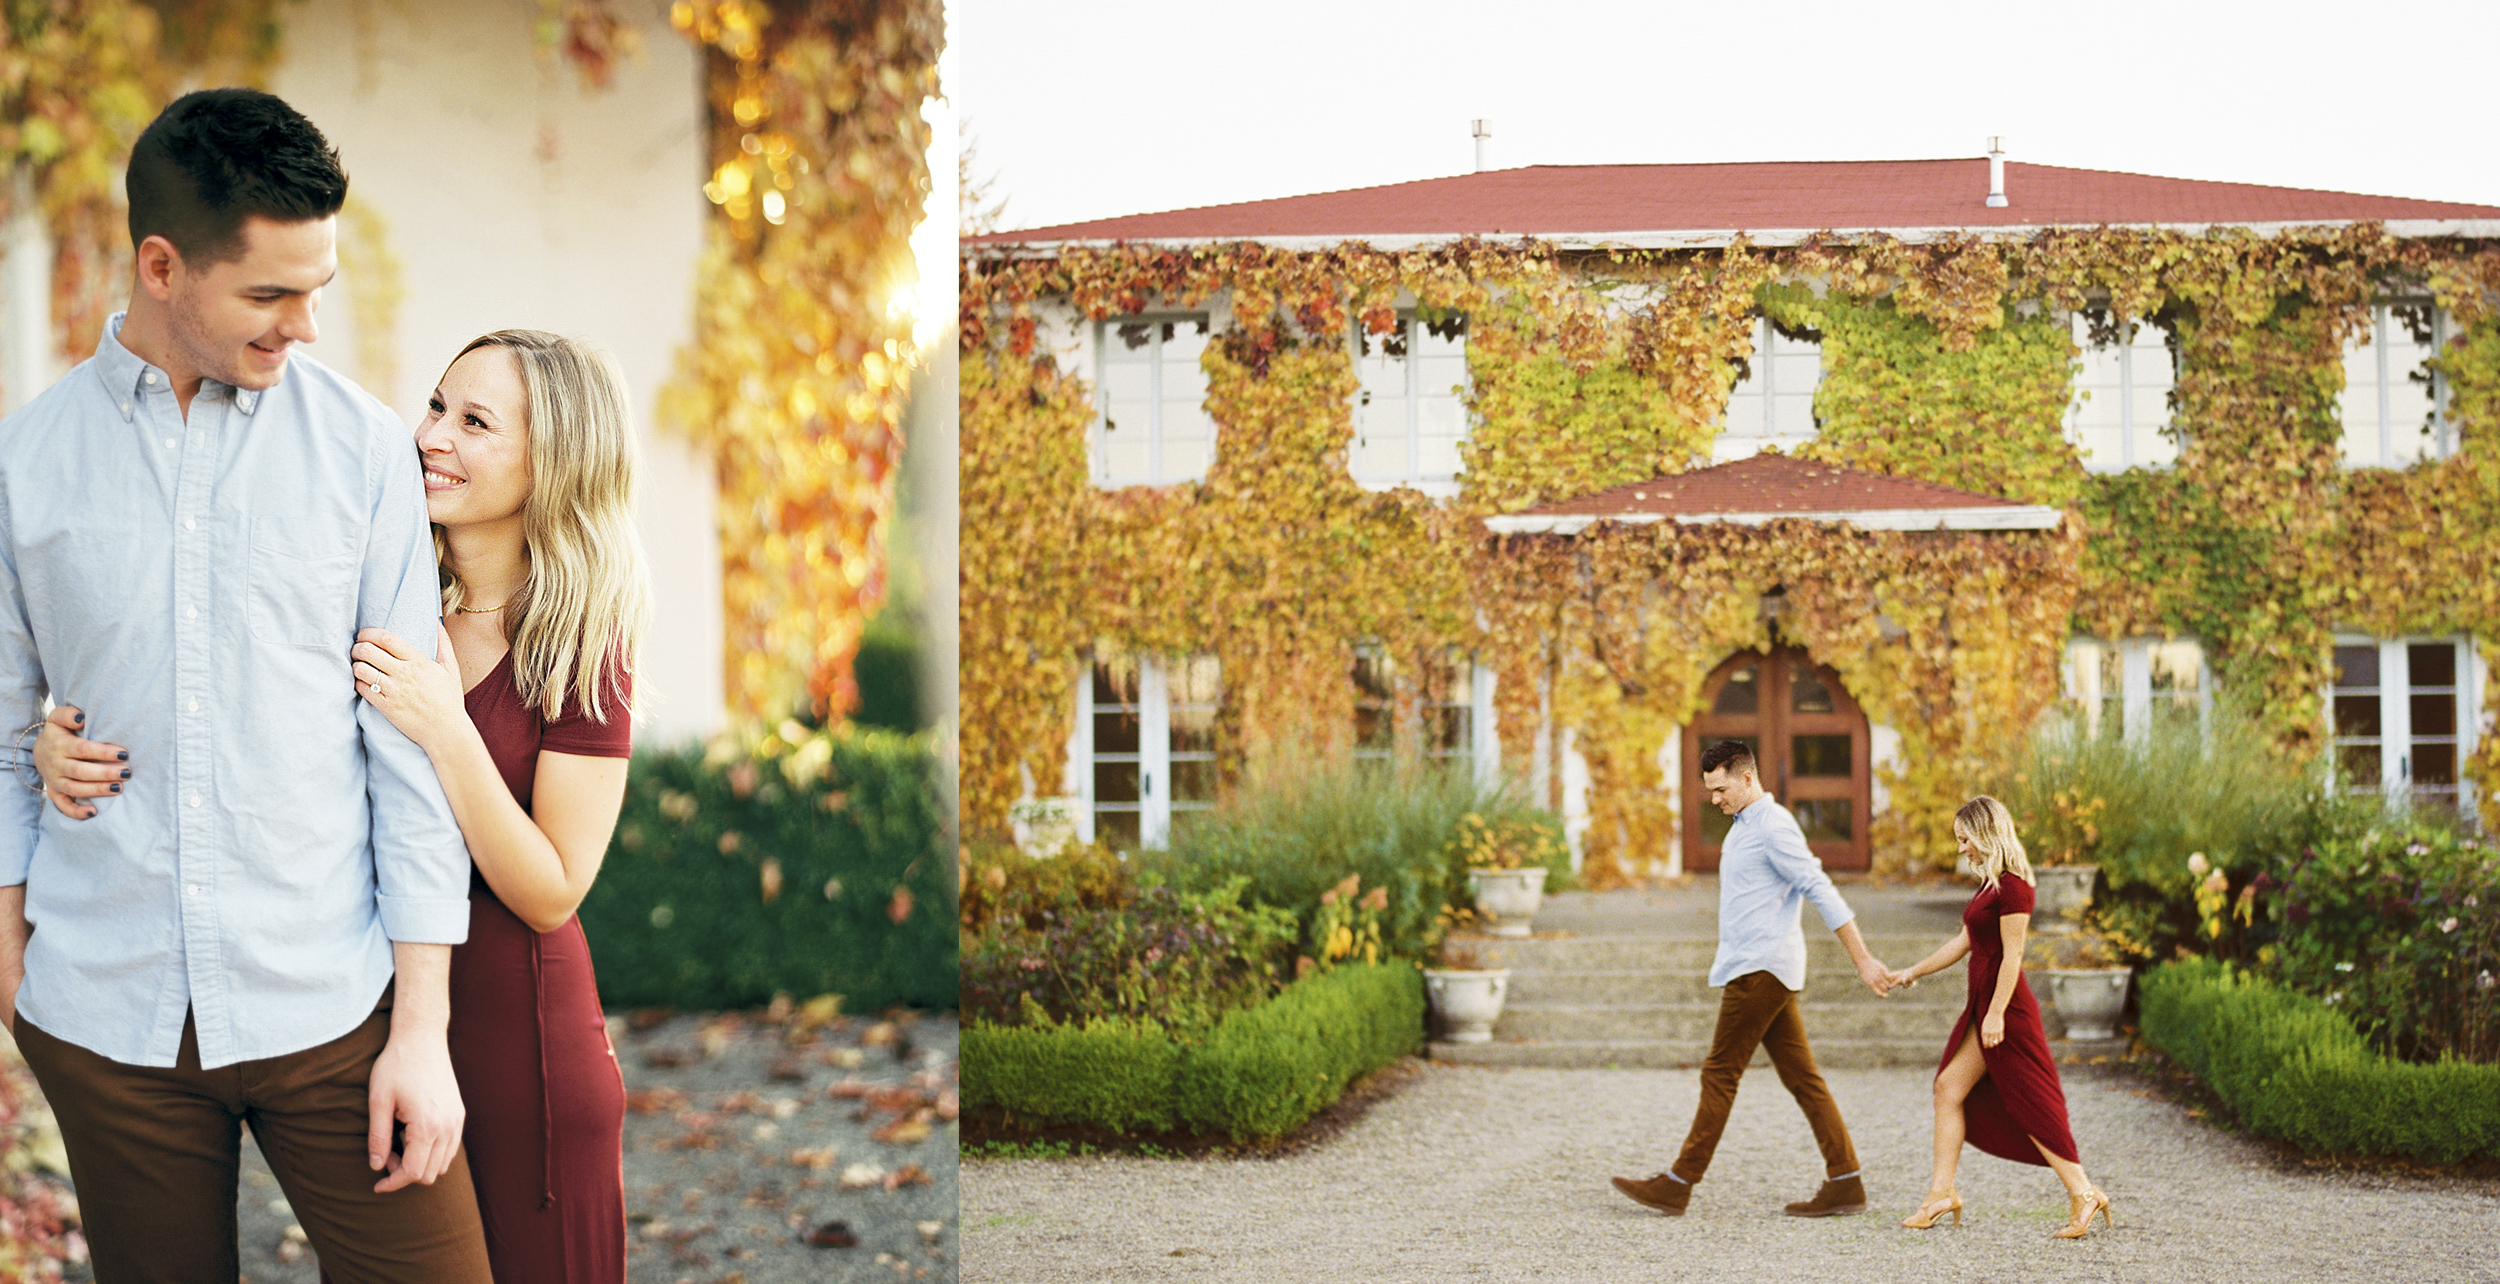 09_best+bay+area+malibu+LA+wedding+photography+videography+elopement_monet_vineyards_3 copy.jpg